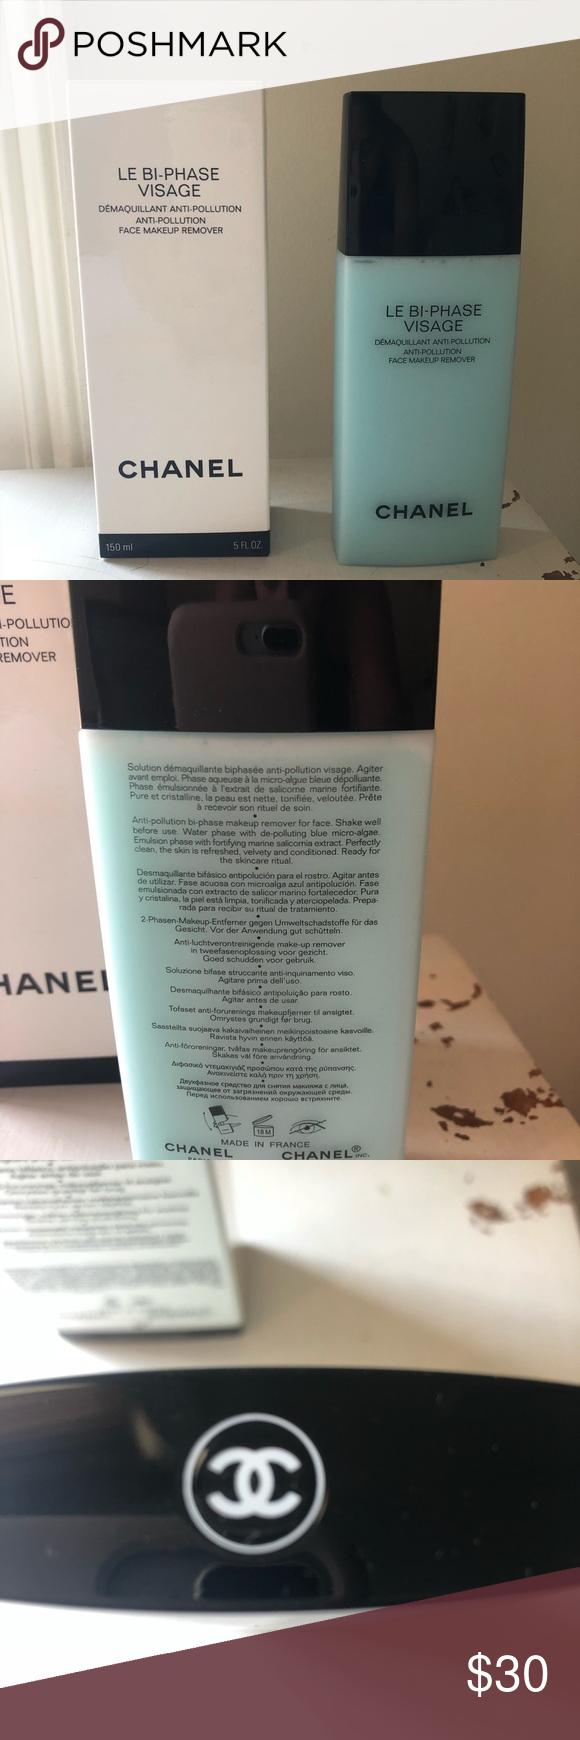 Chanel Face Makeup Remover Face makeup remover, Makeup